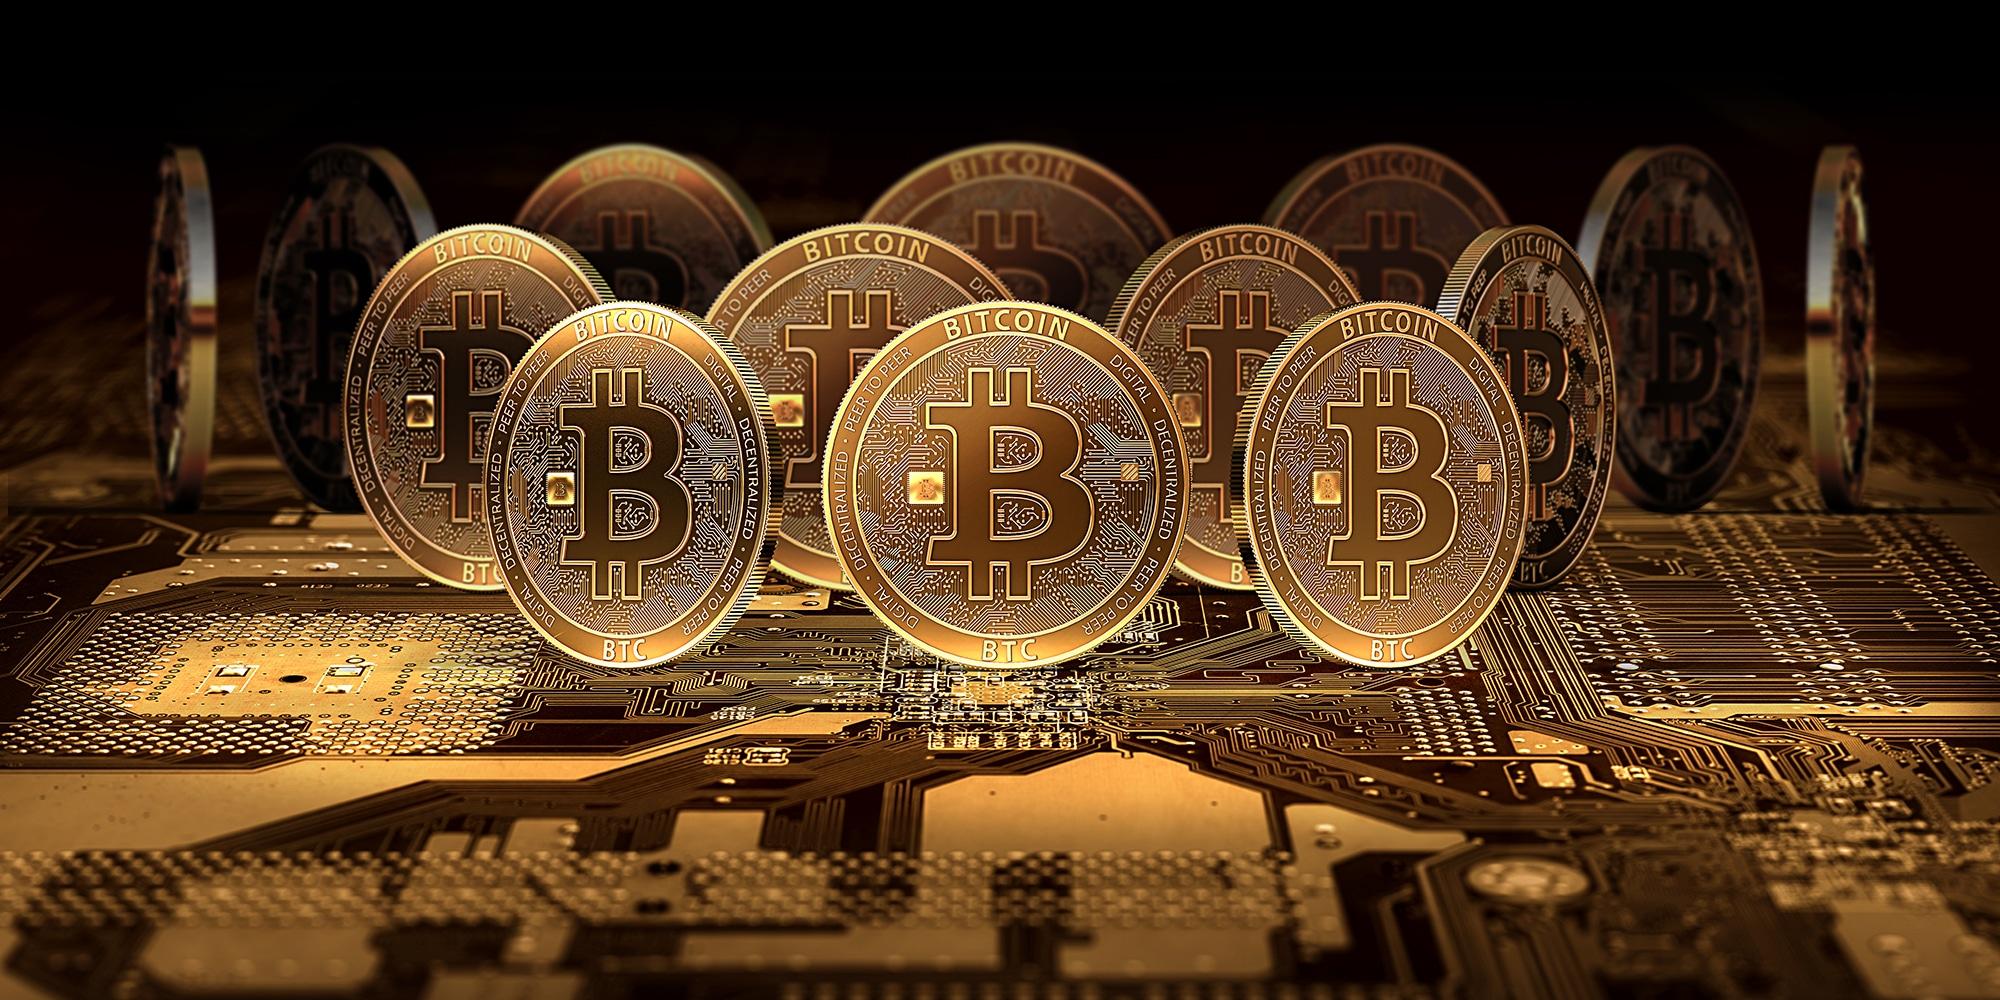 How_to_send_receive_Bitcoin_v2_2000_1000-1.jpg